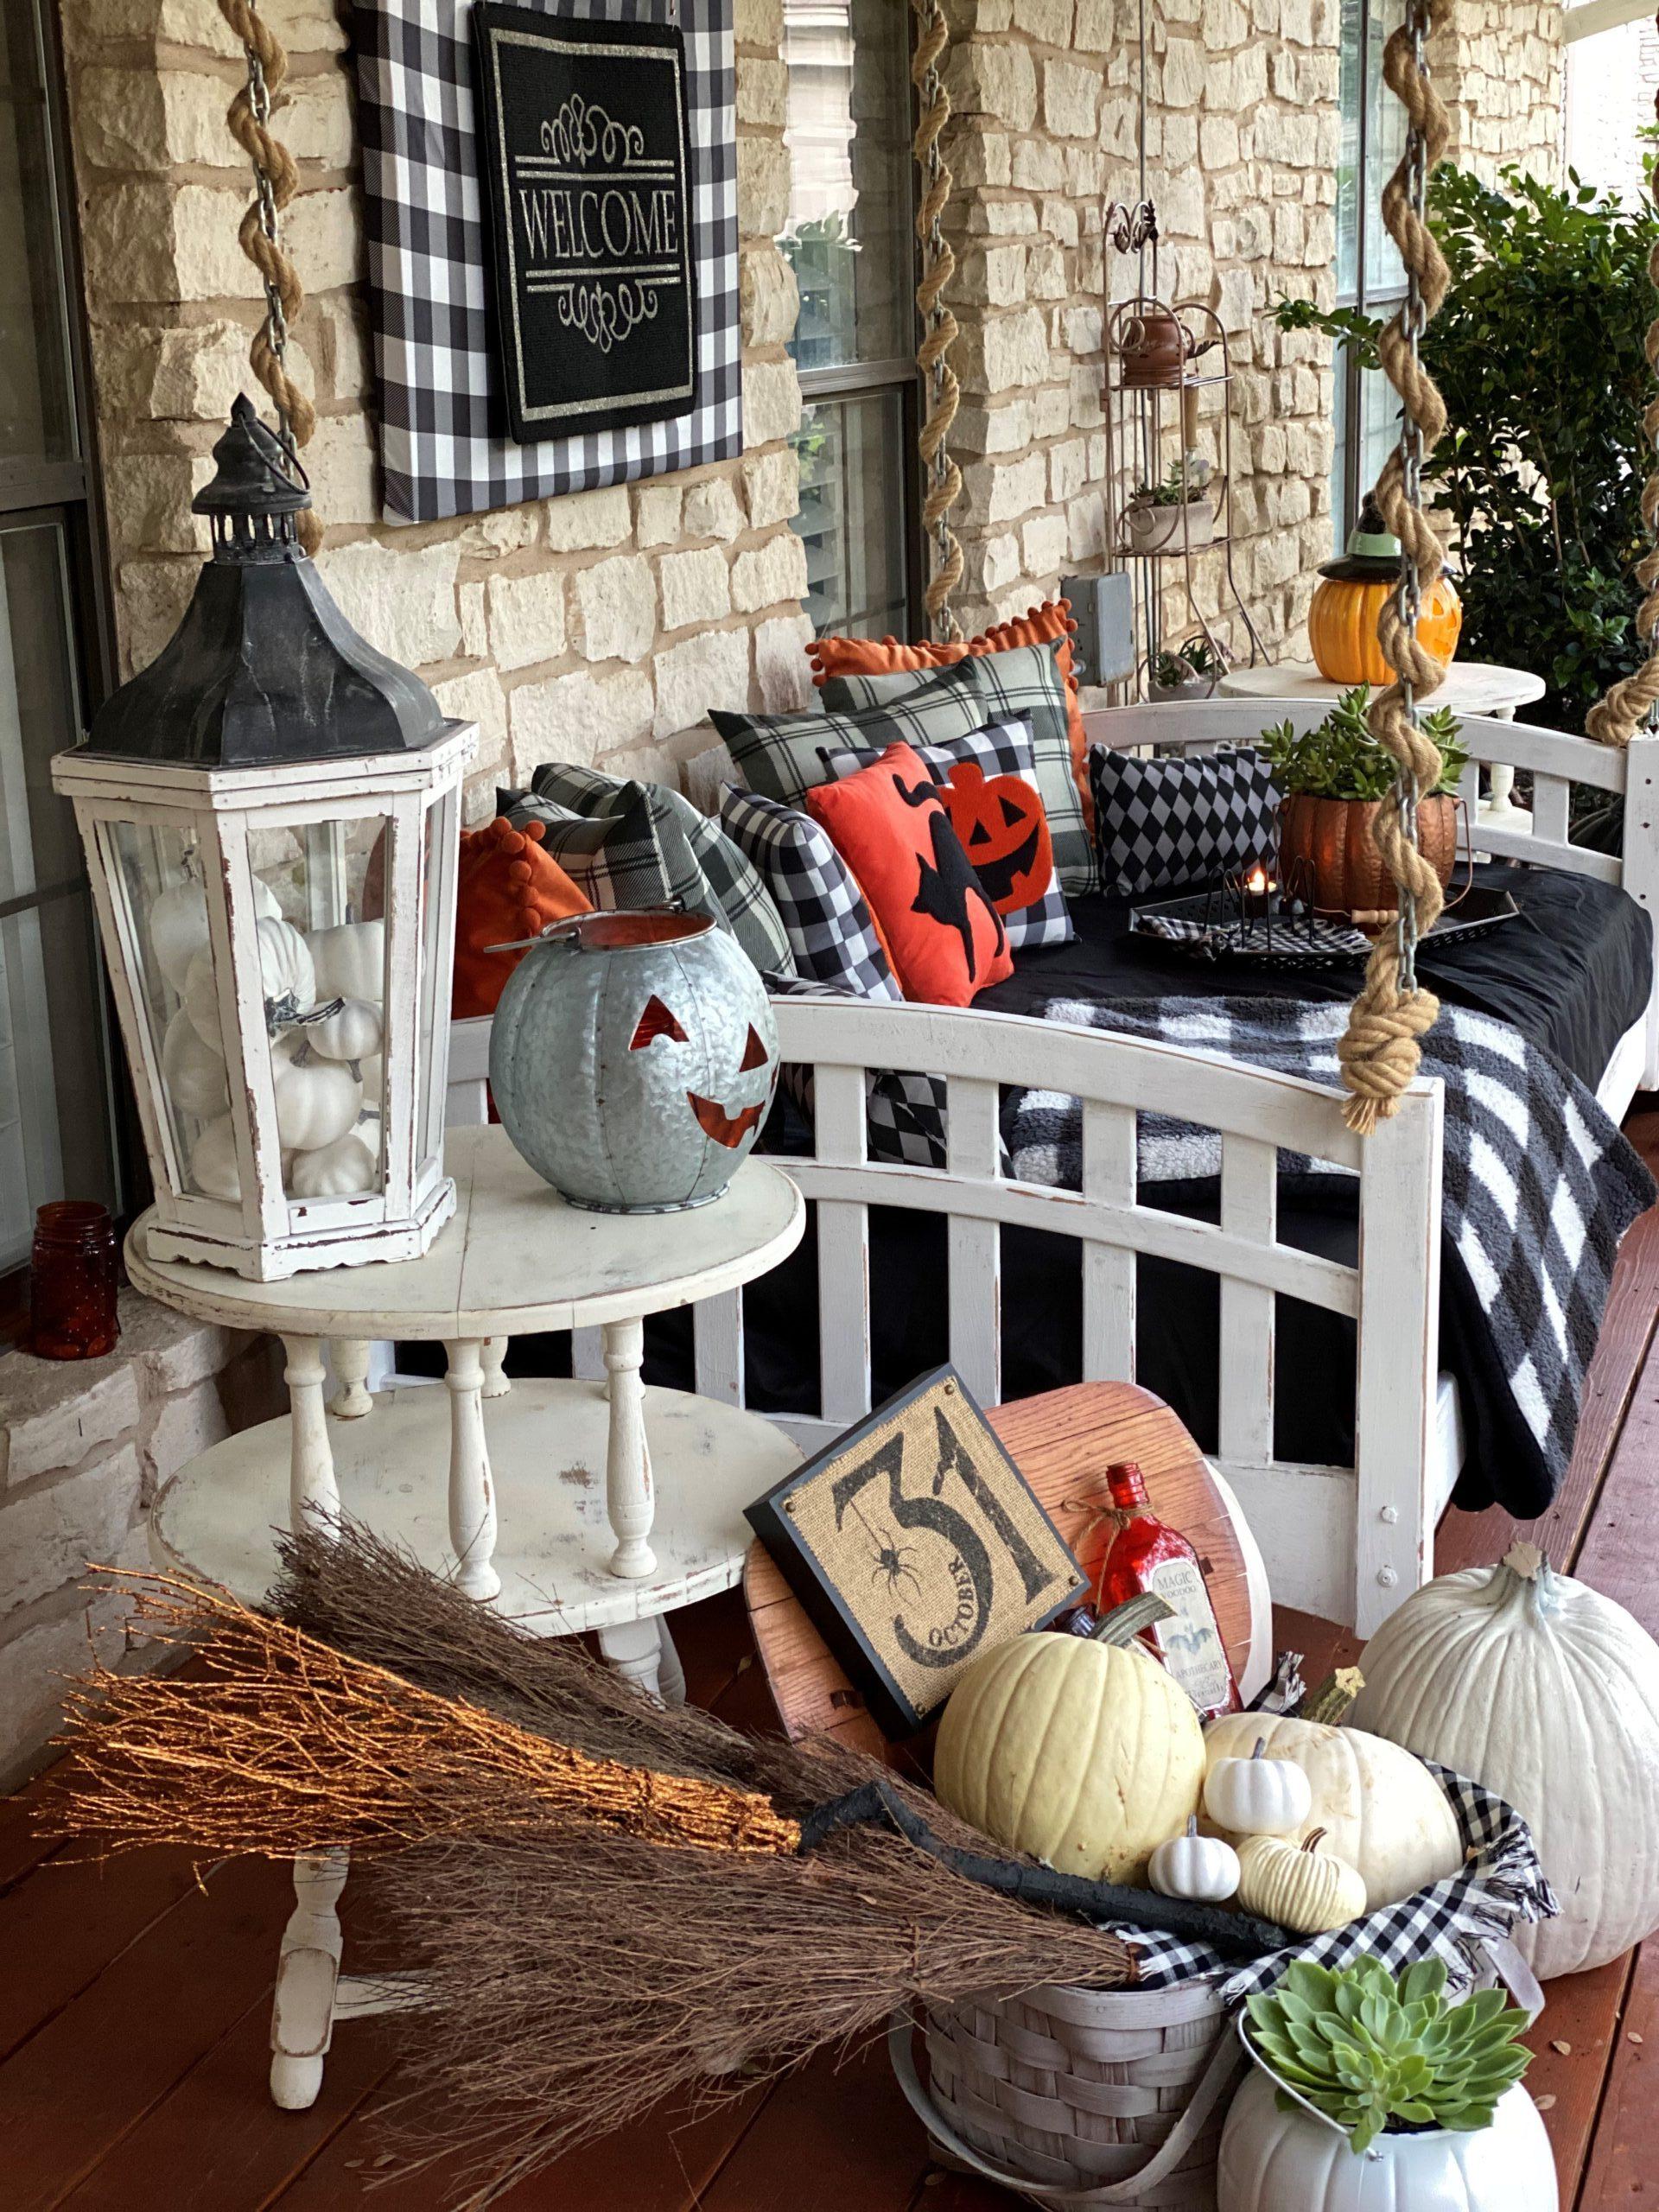 Halloween Front Porch Decorations, Vintage Rustic Front Porch